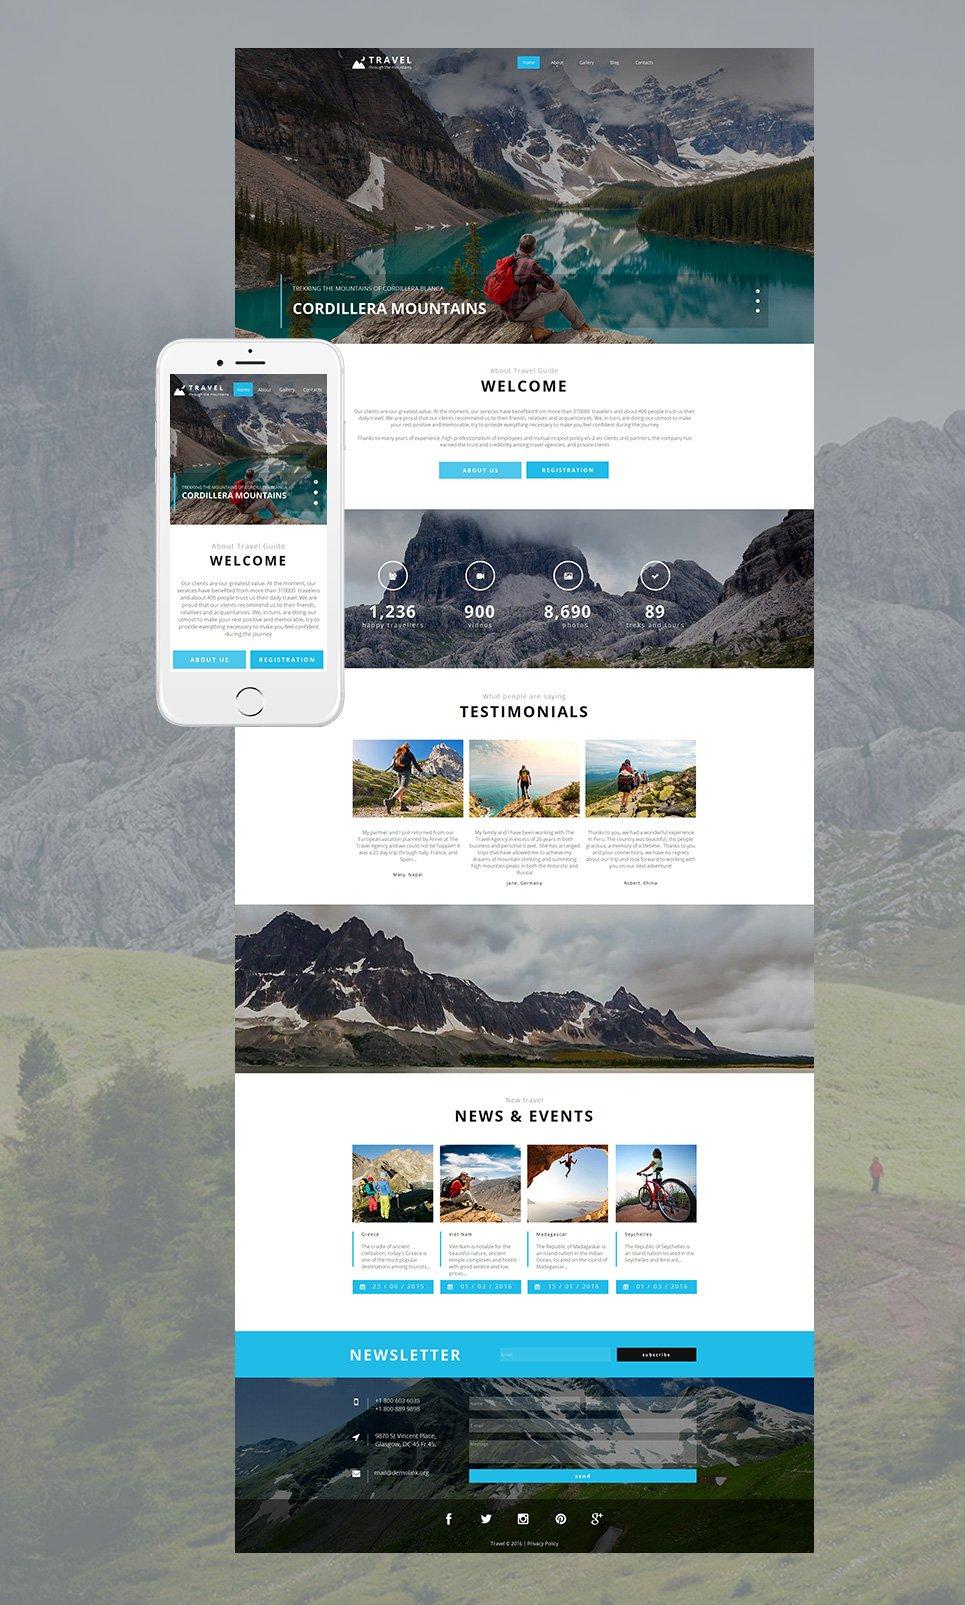 MotoCMS HTML Шаблон #58474 из категории Путешествия - image